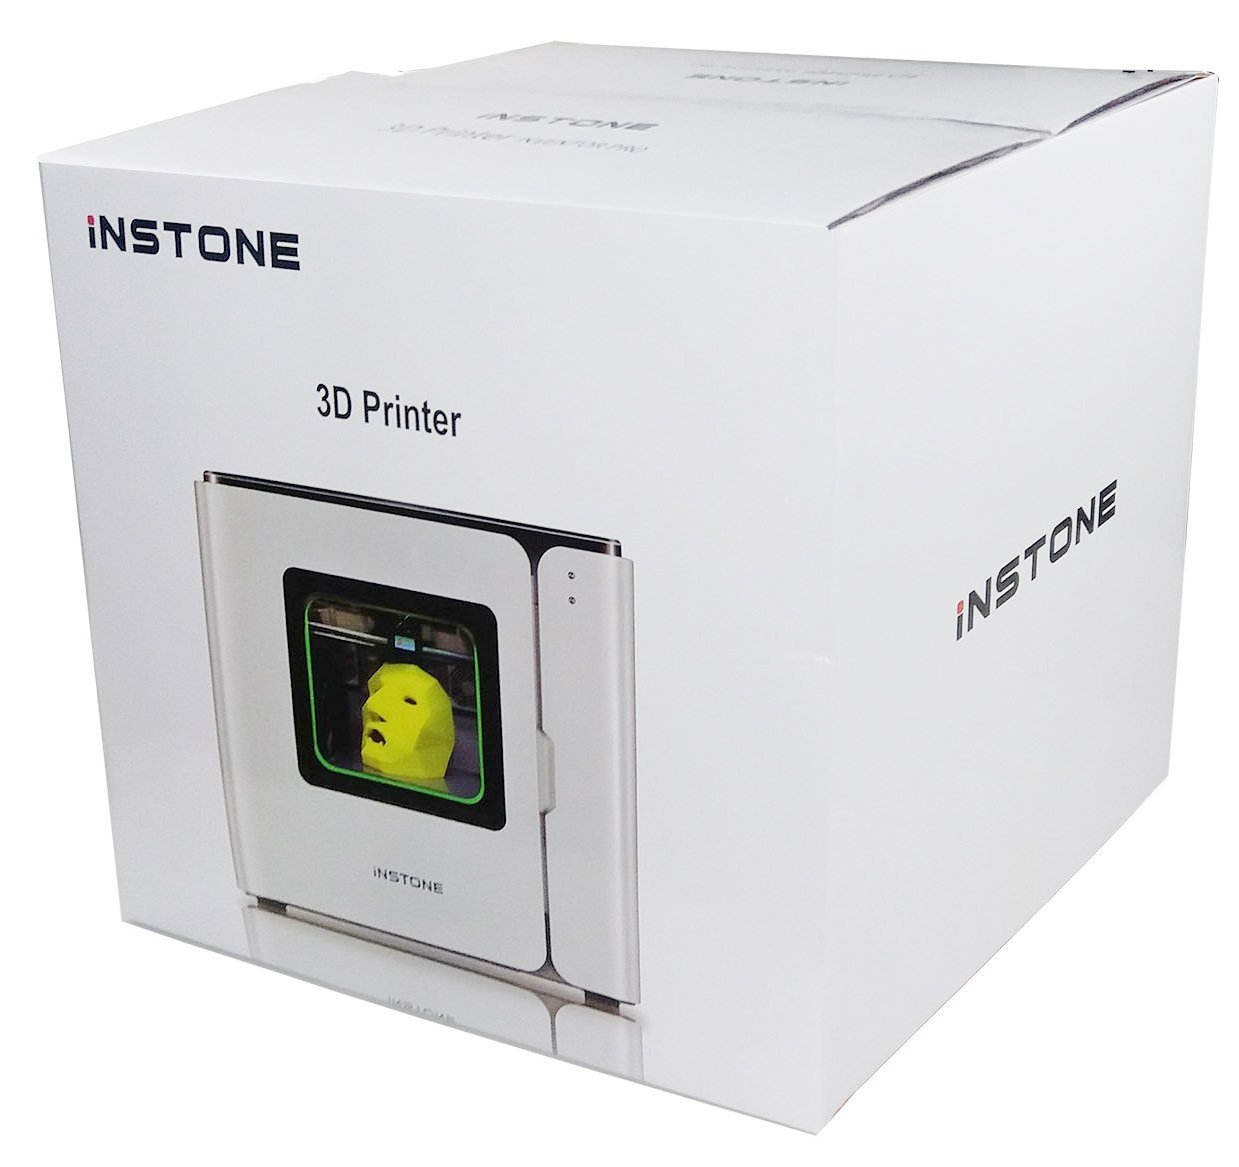 Instone Impresora 3D 3,5 Pulgadas Pantalla Táctil Tamaño 17.36 ...